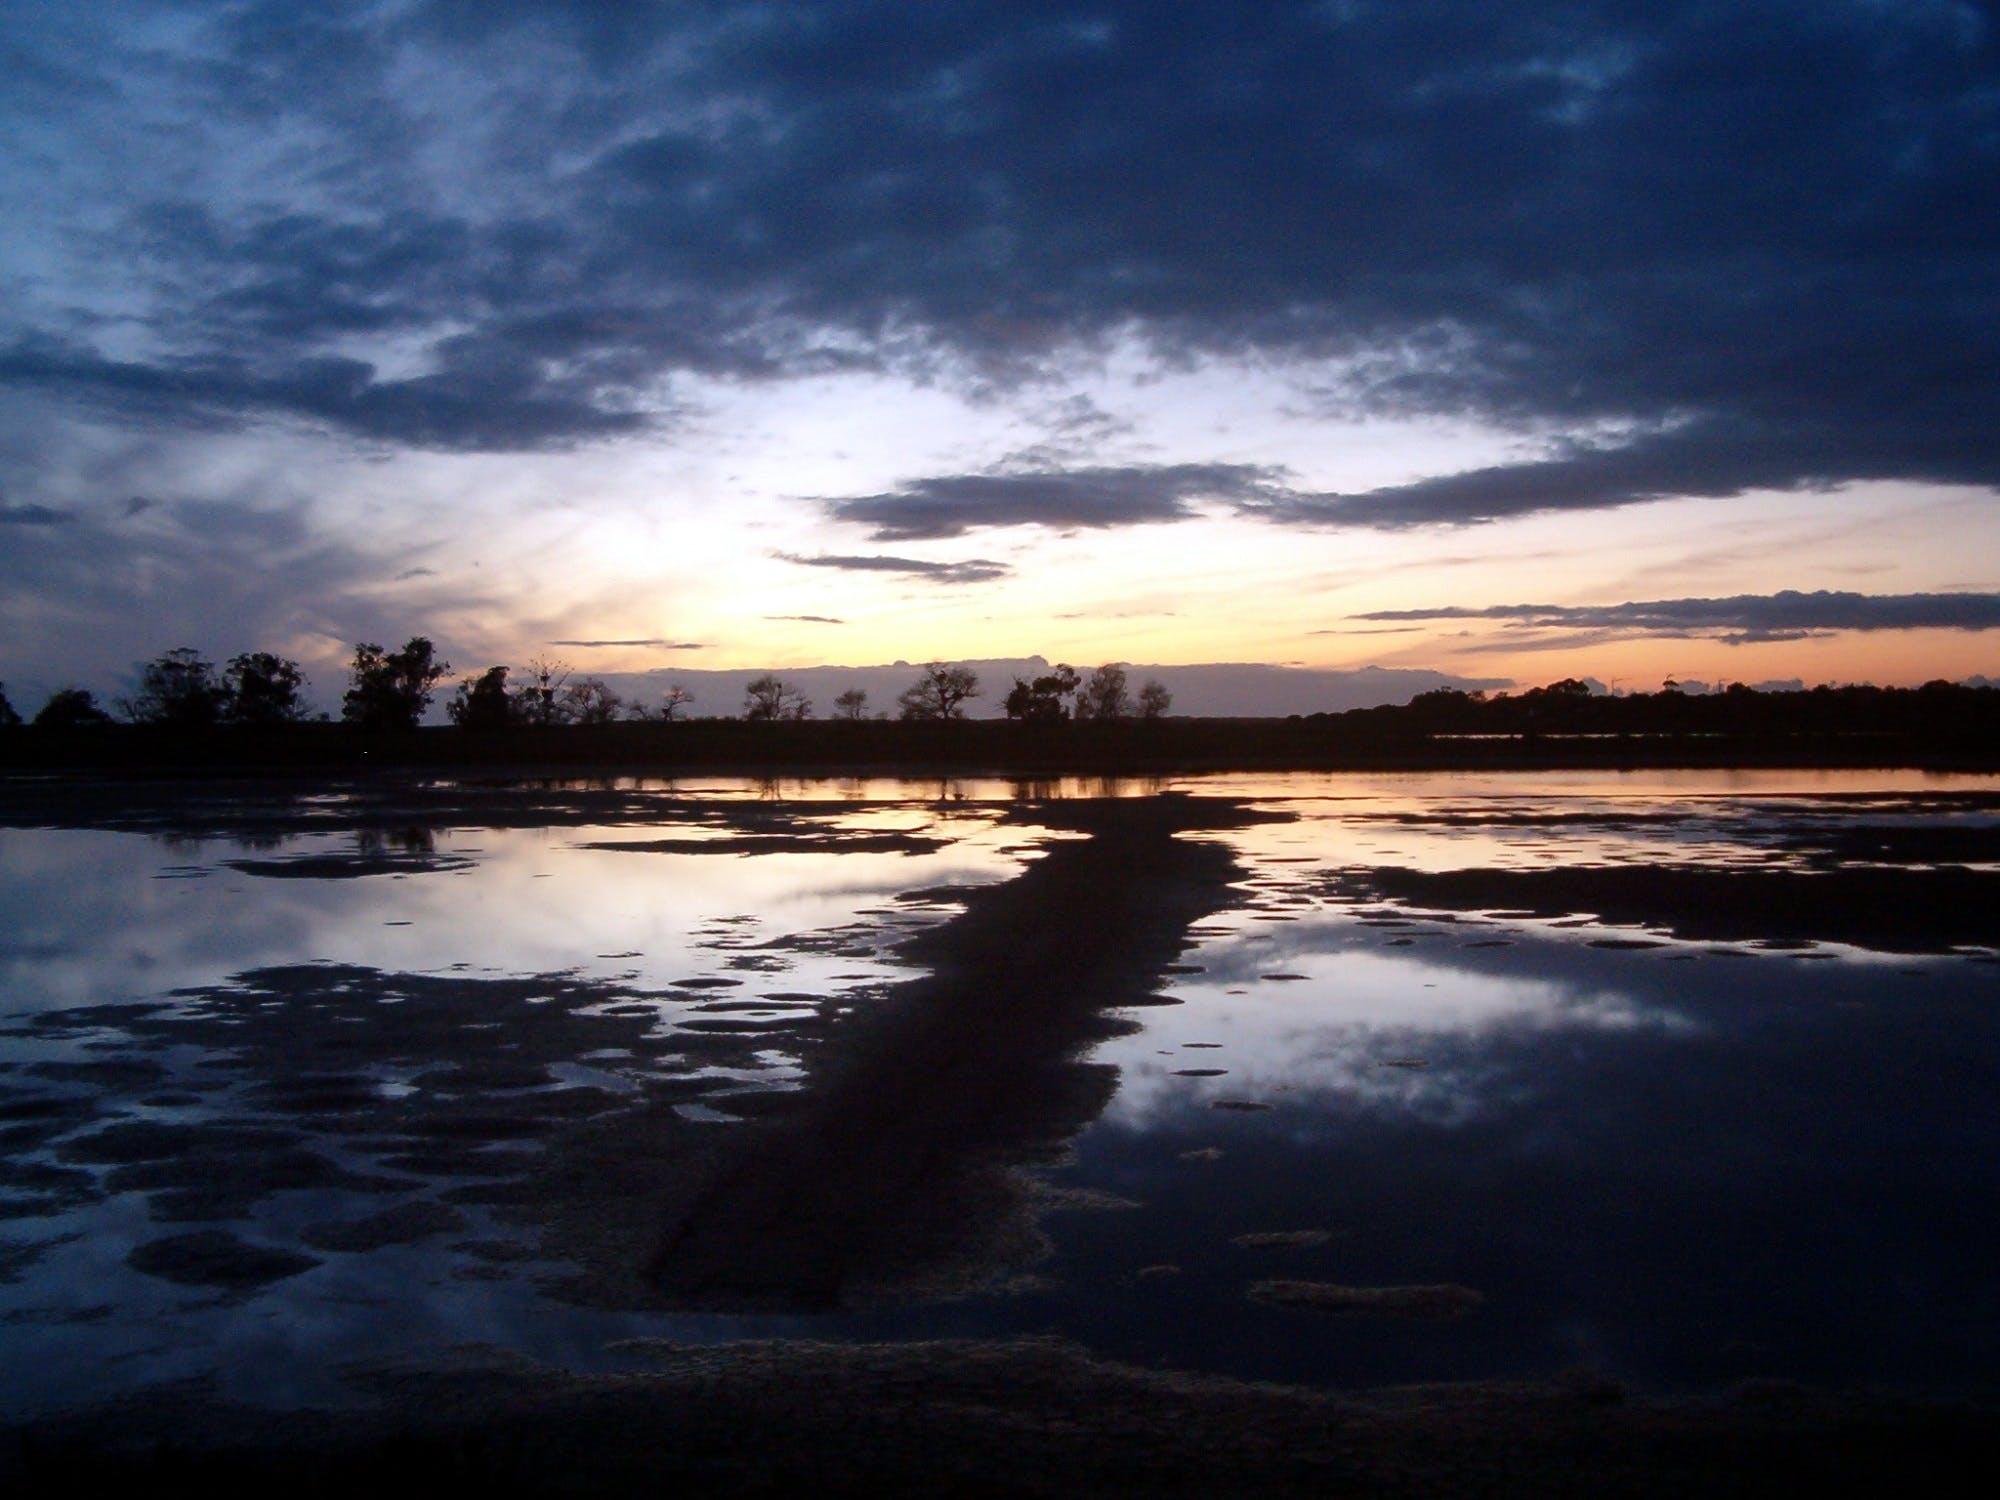 Kostenloses Stock Foto zu himmel, landsape, natur, sonnenuntergang